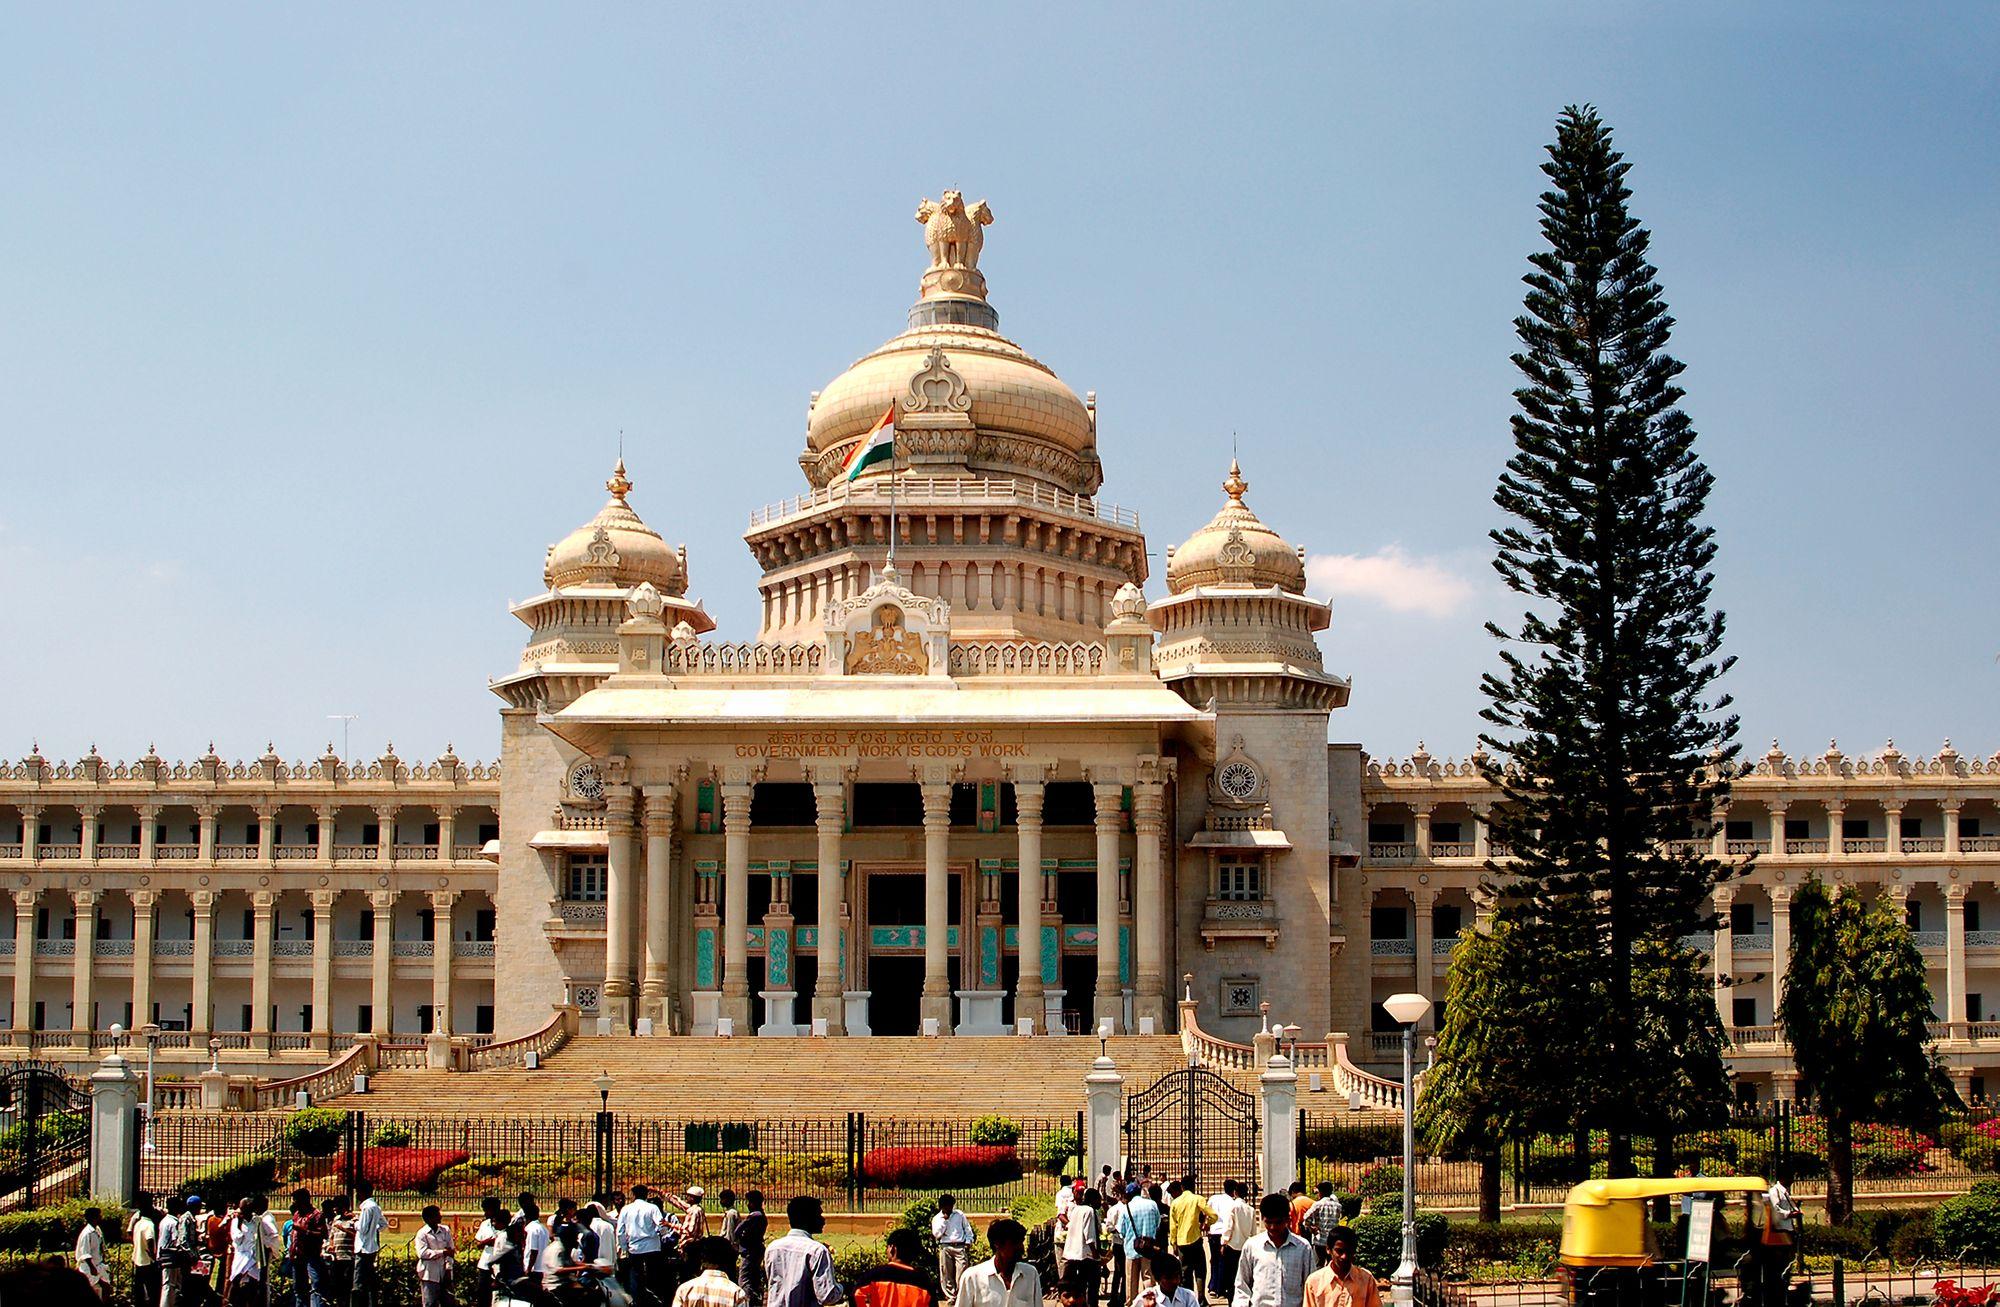 The Vidhana Soudha is the seat of the state legislature of Karnataka.